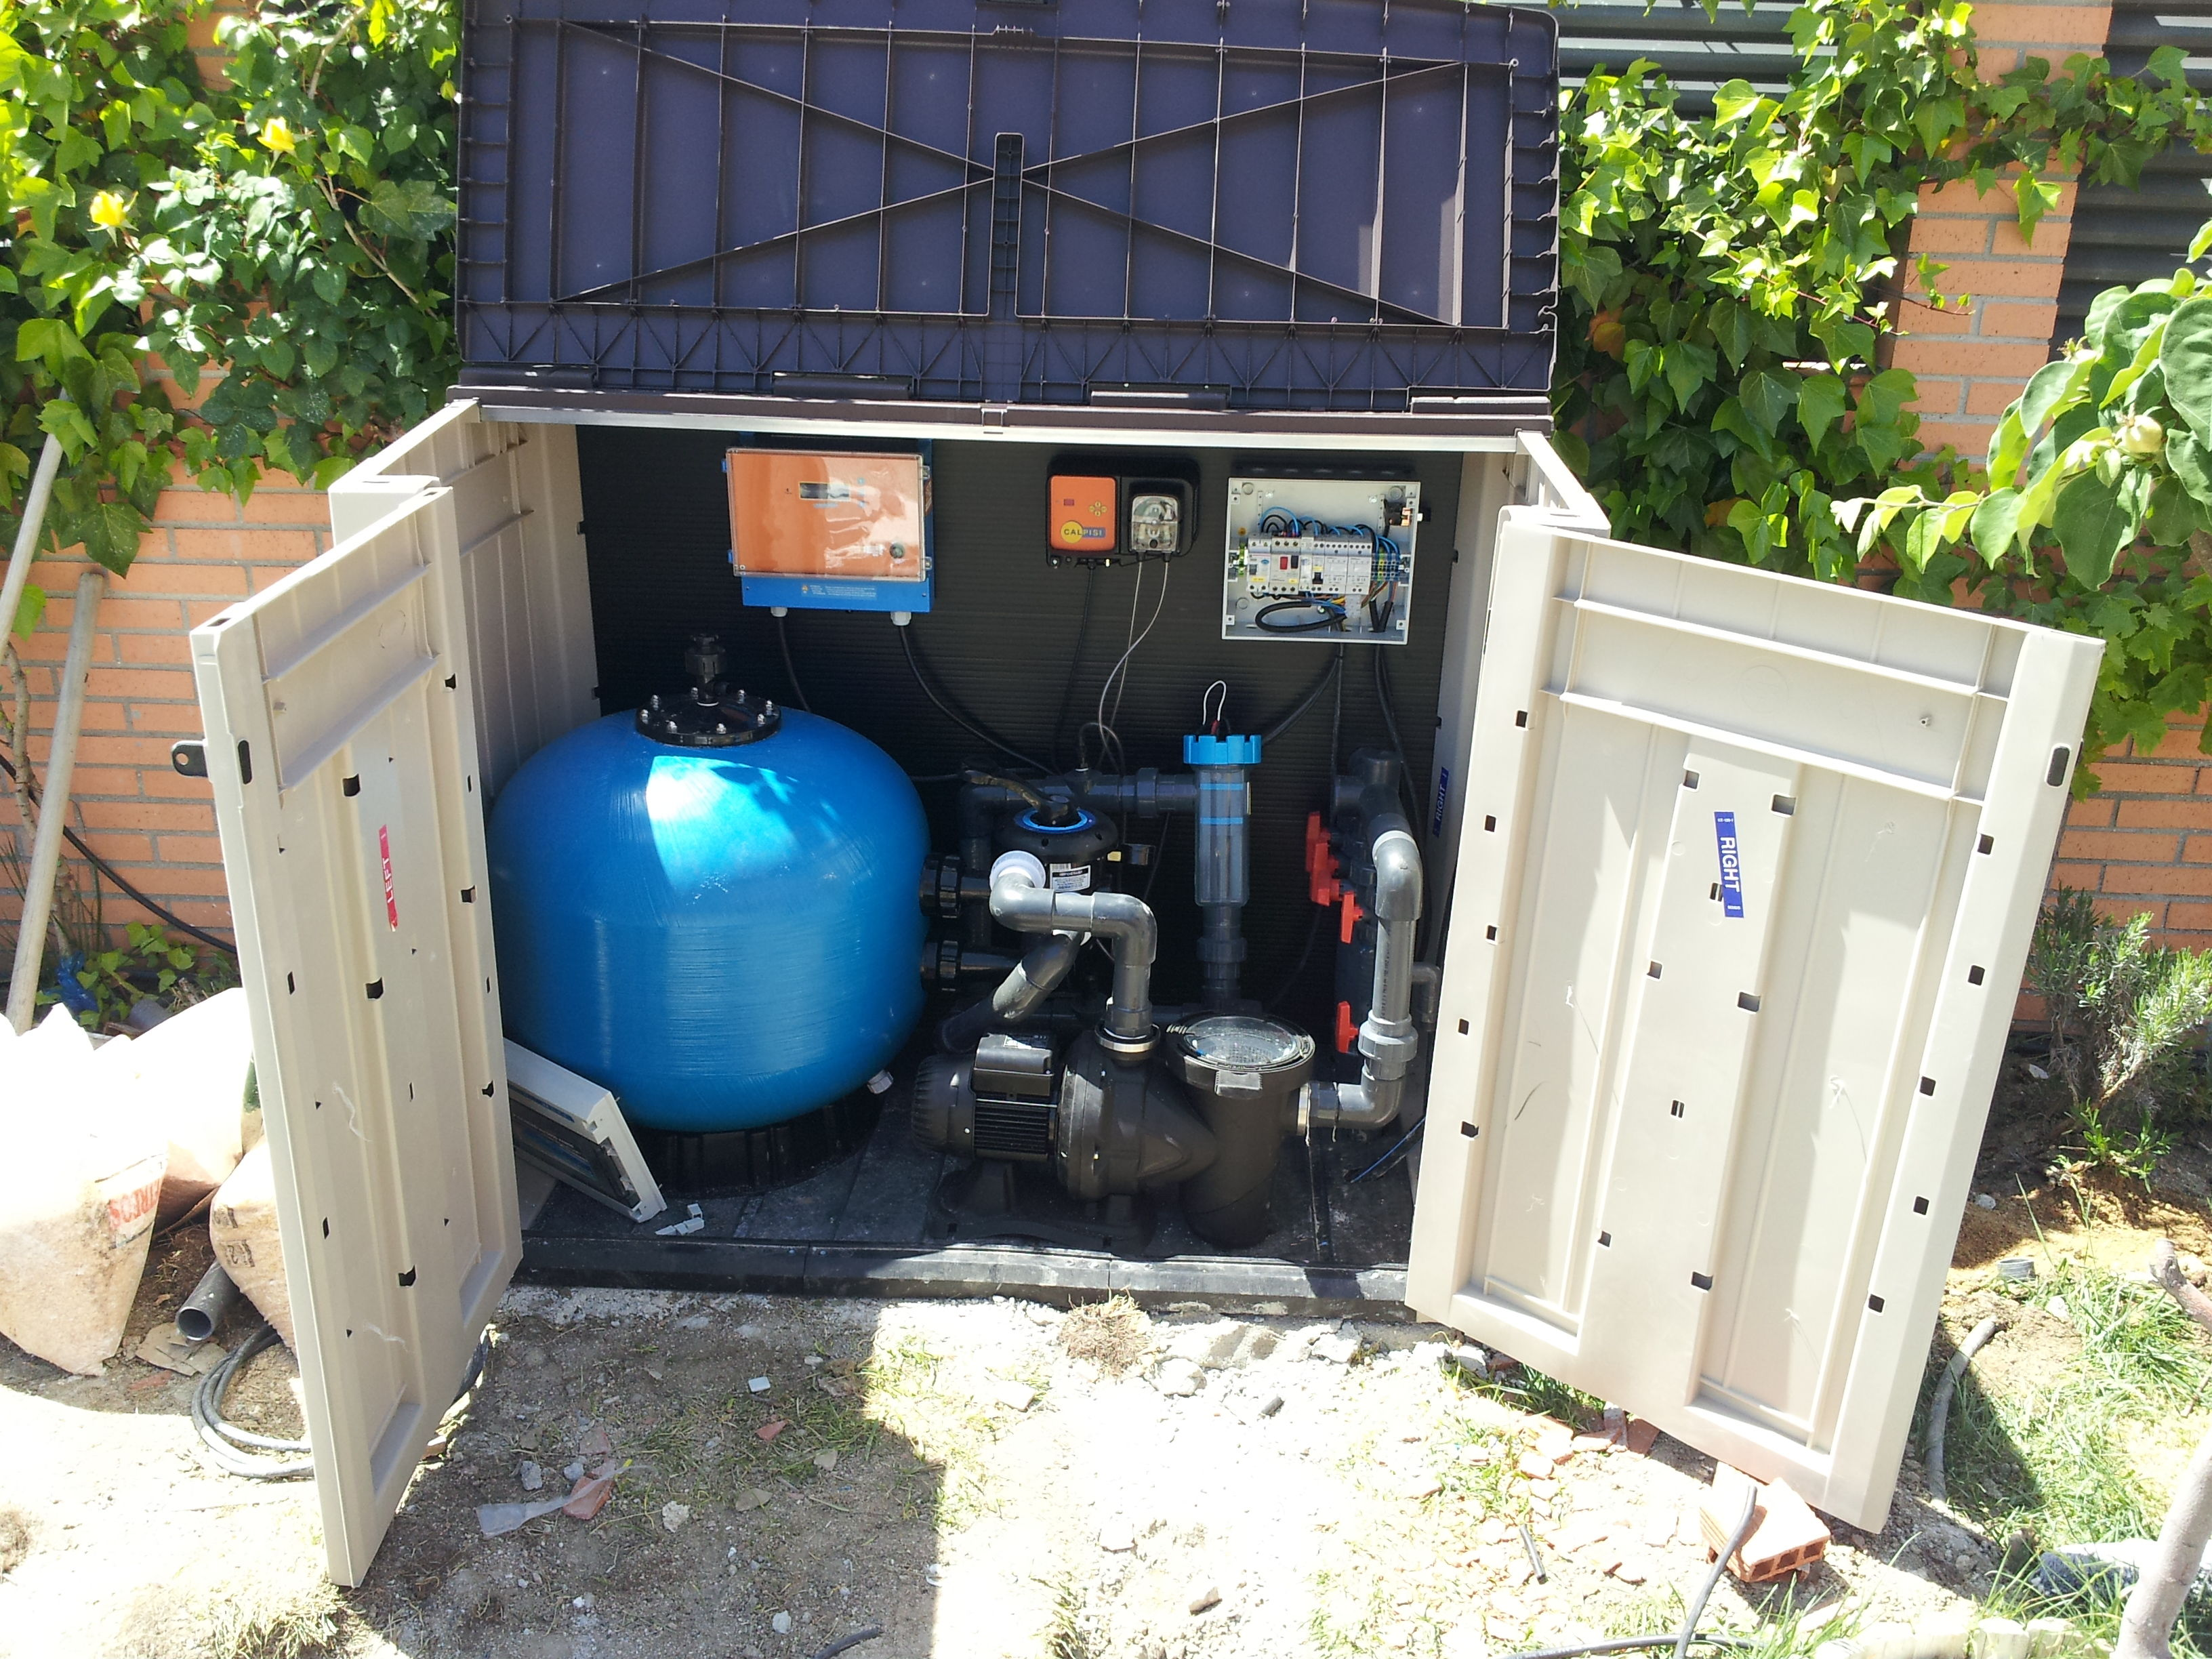 Depuradora de exterior cat logo de piscinas lualpool for Piscinas desmontables pequenas con depuradora